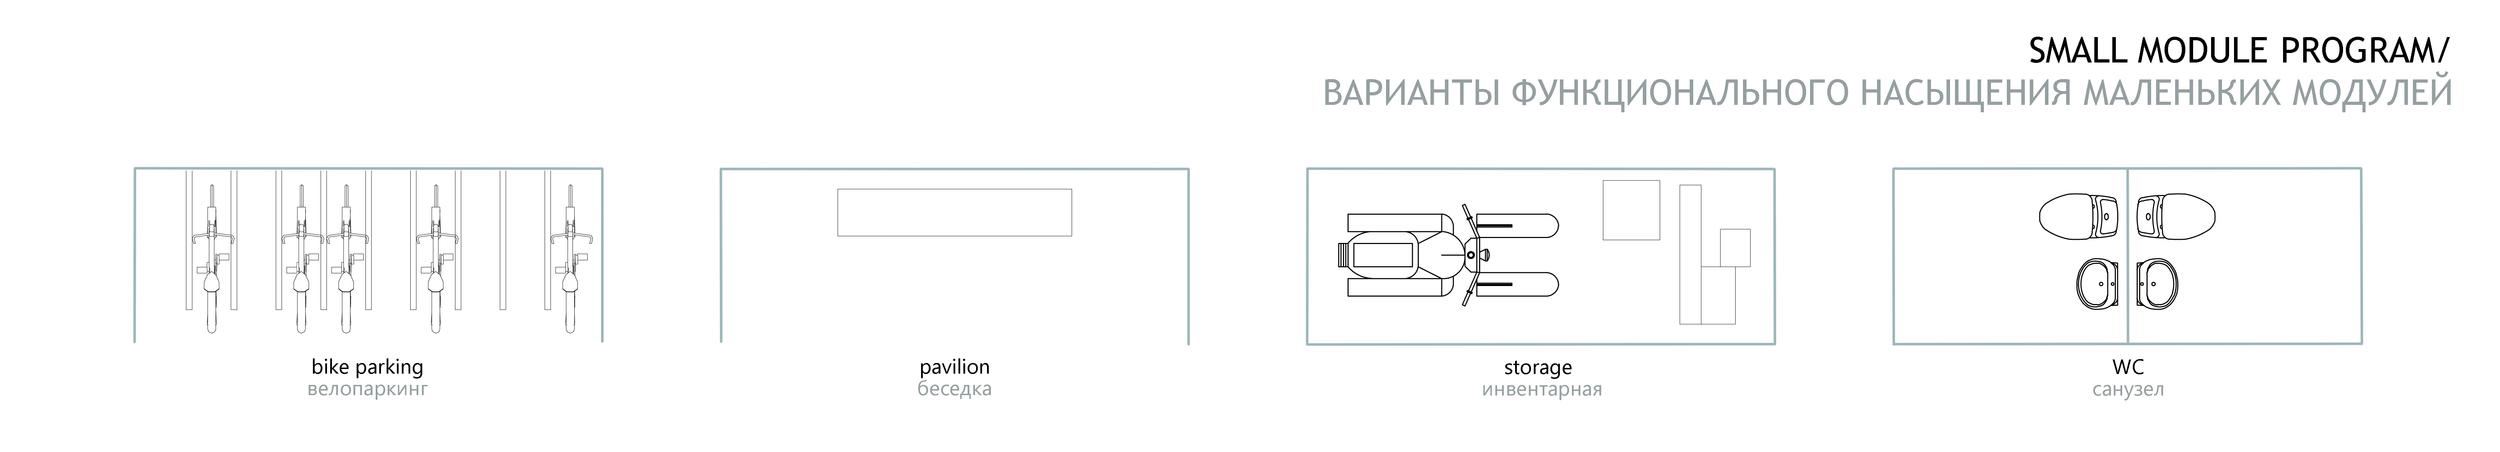 5_модули.jpg